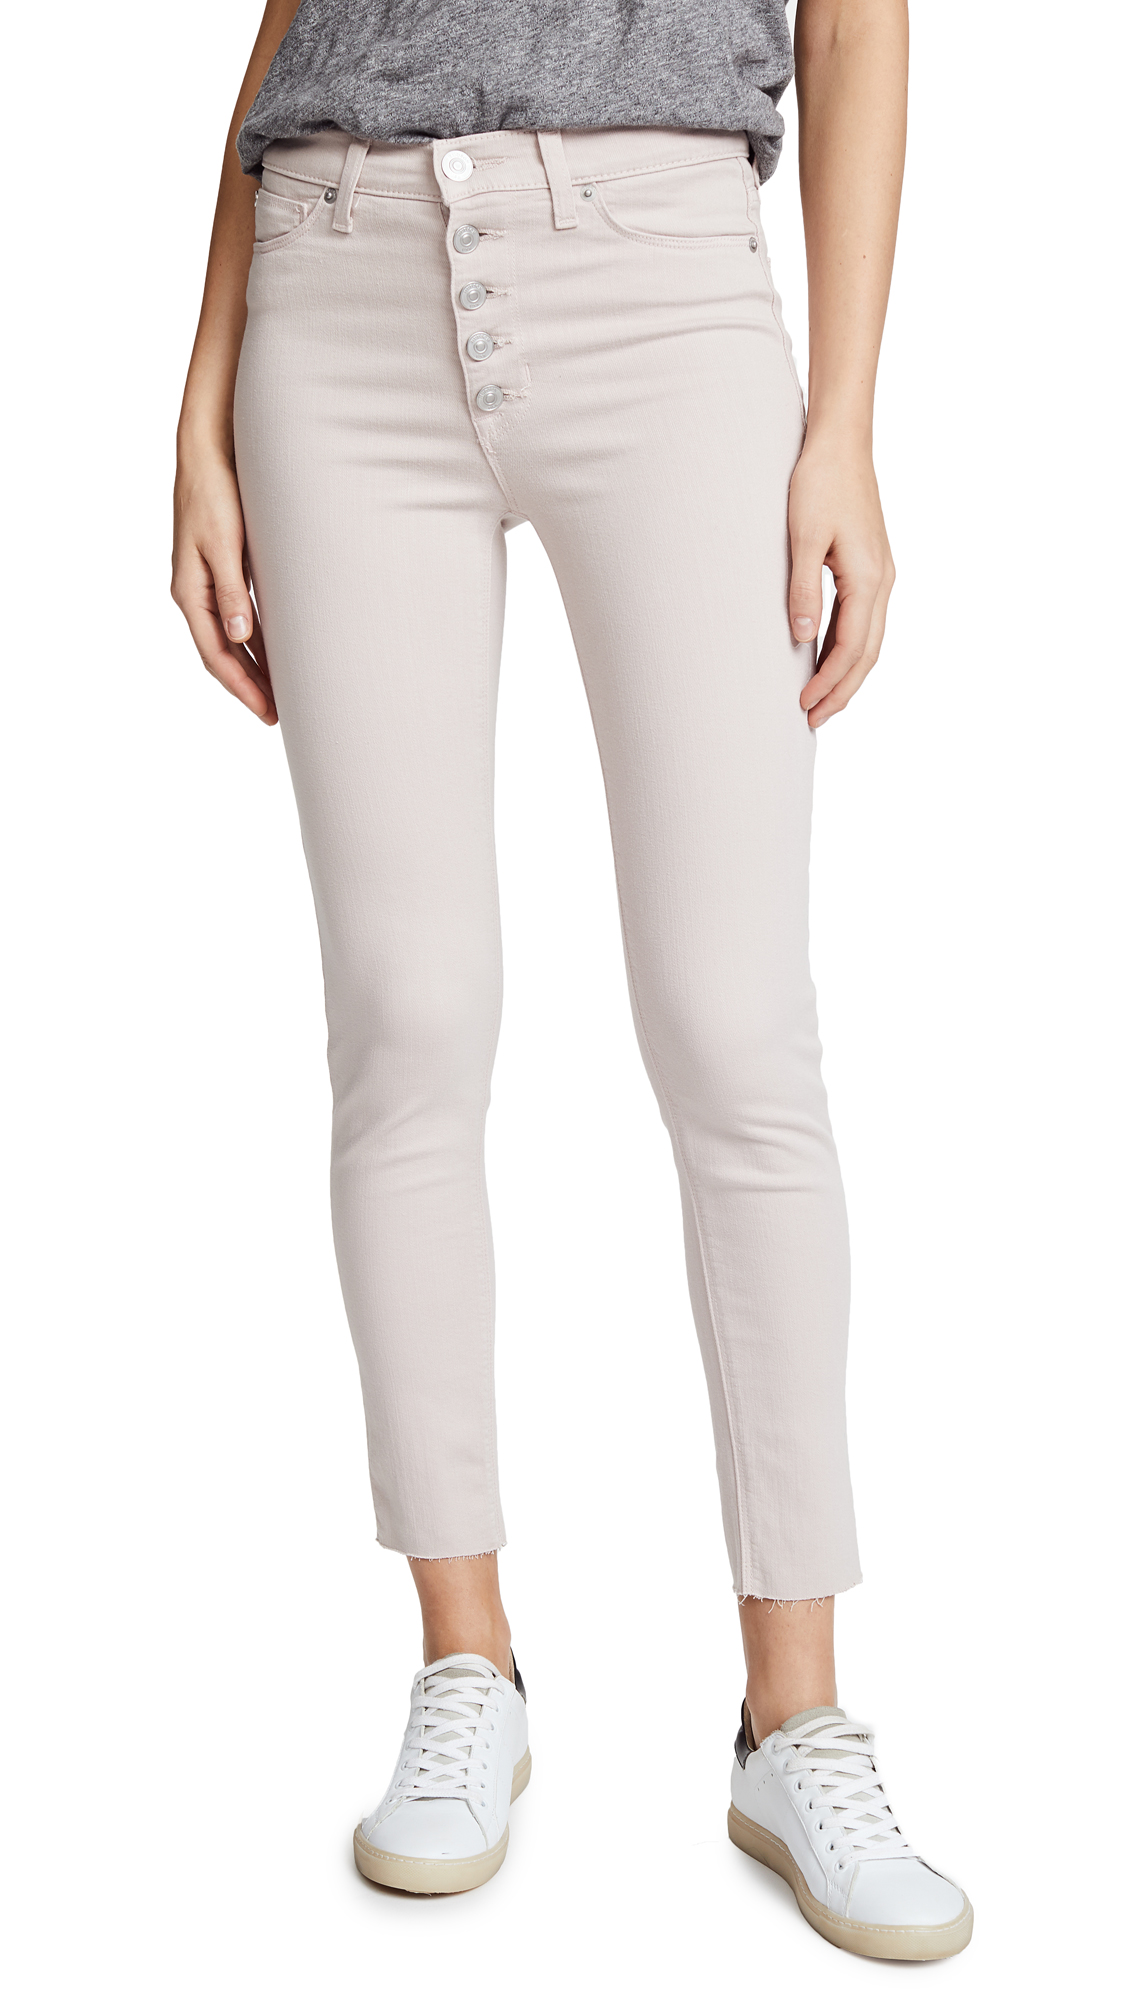 Hudson Barbara High Waist Super Skinny Jeans In Blushing